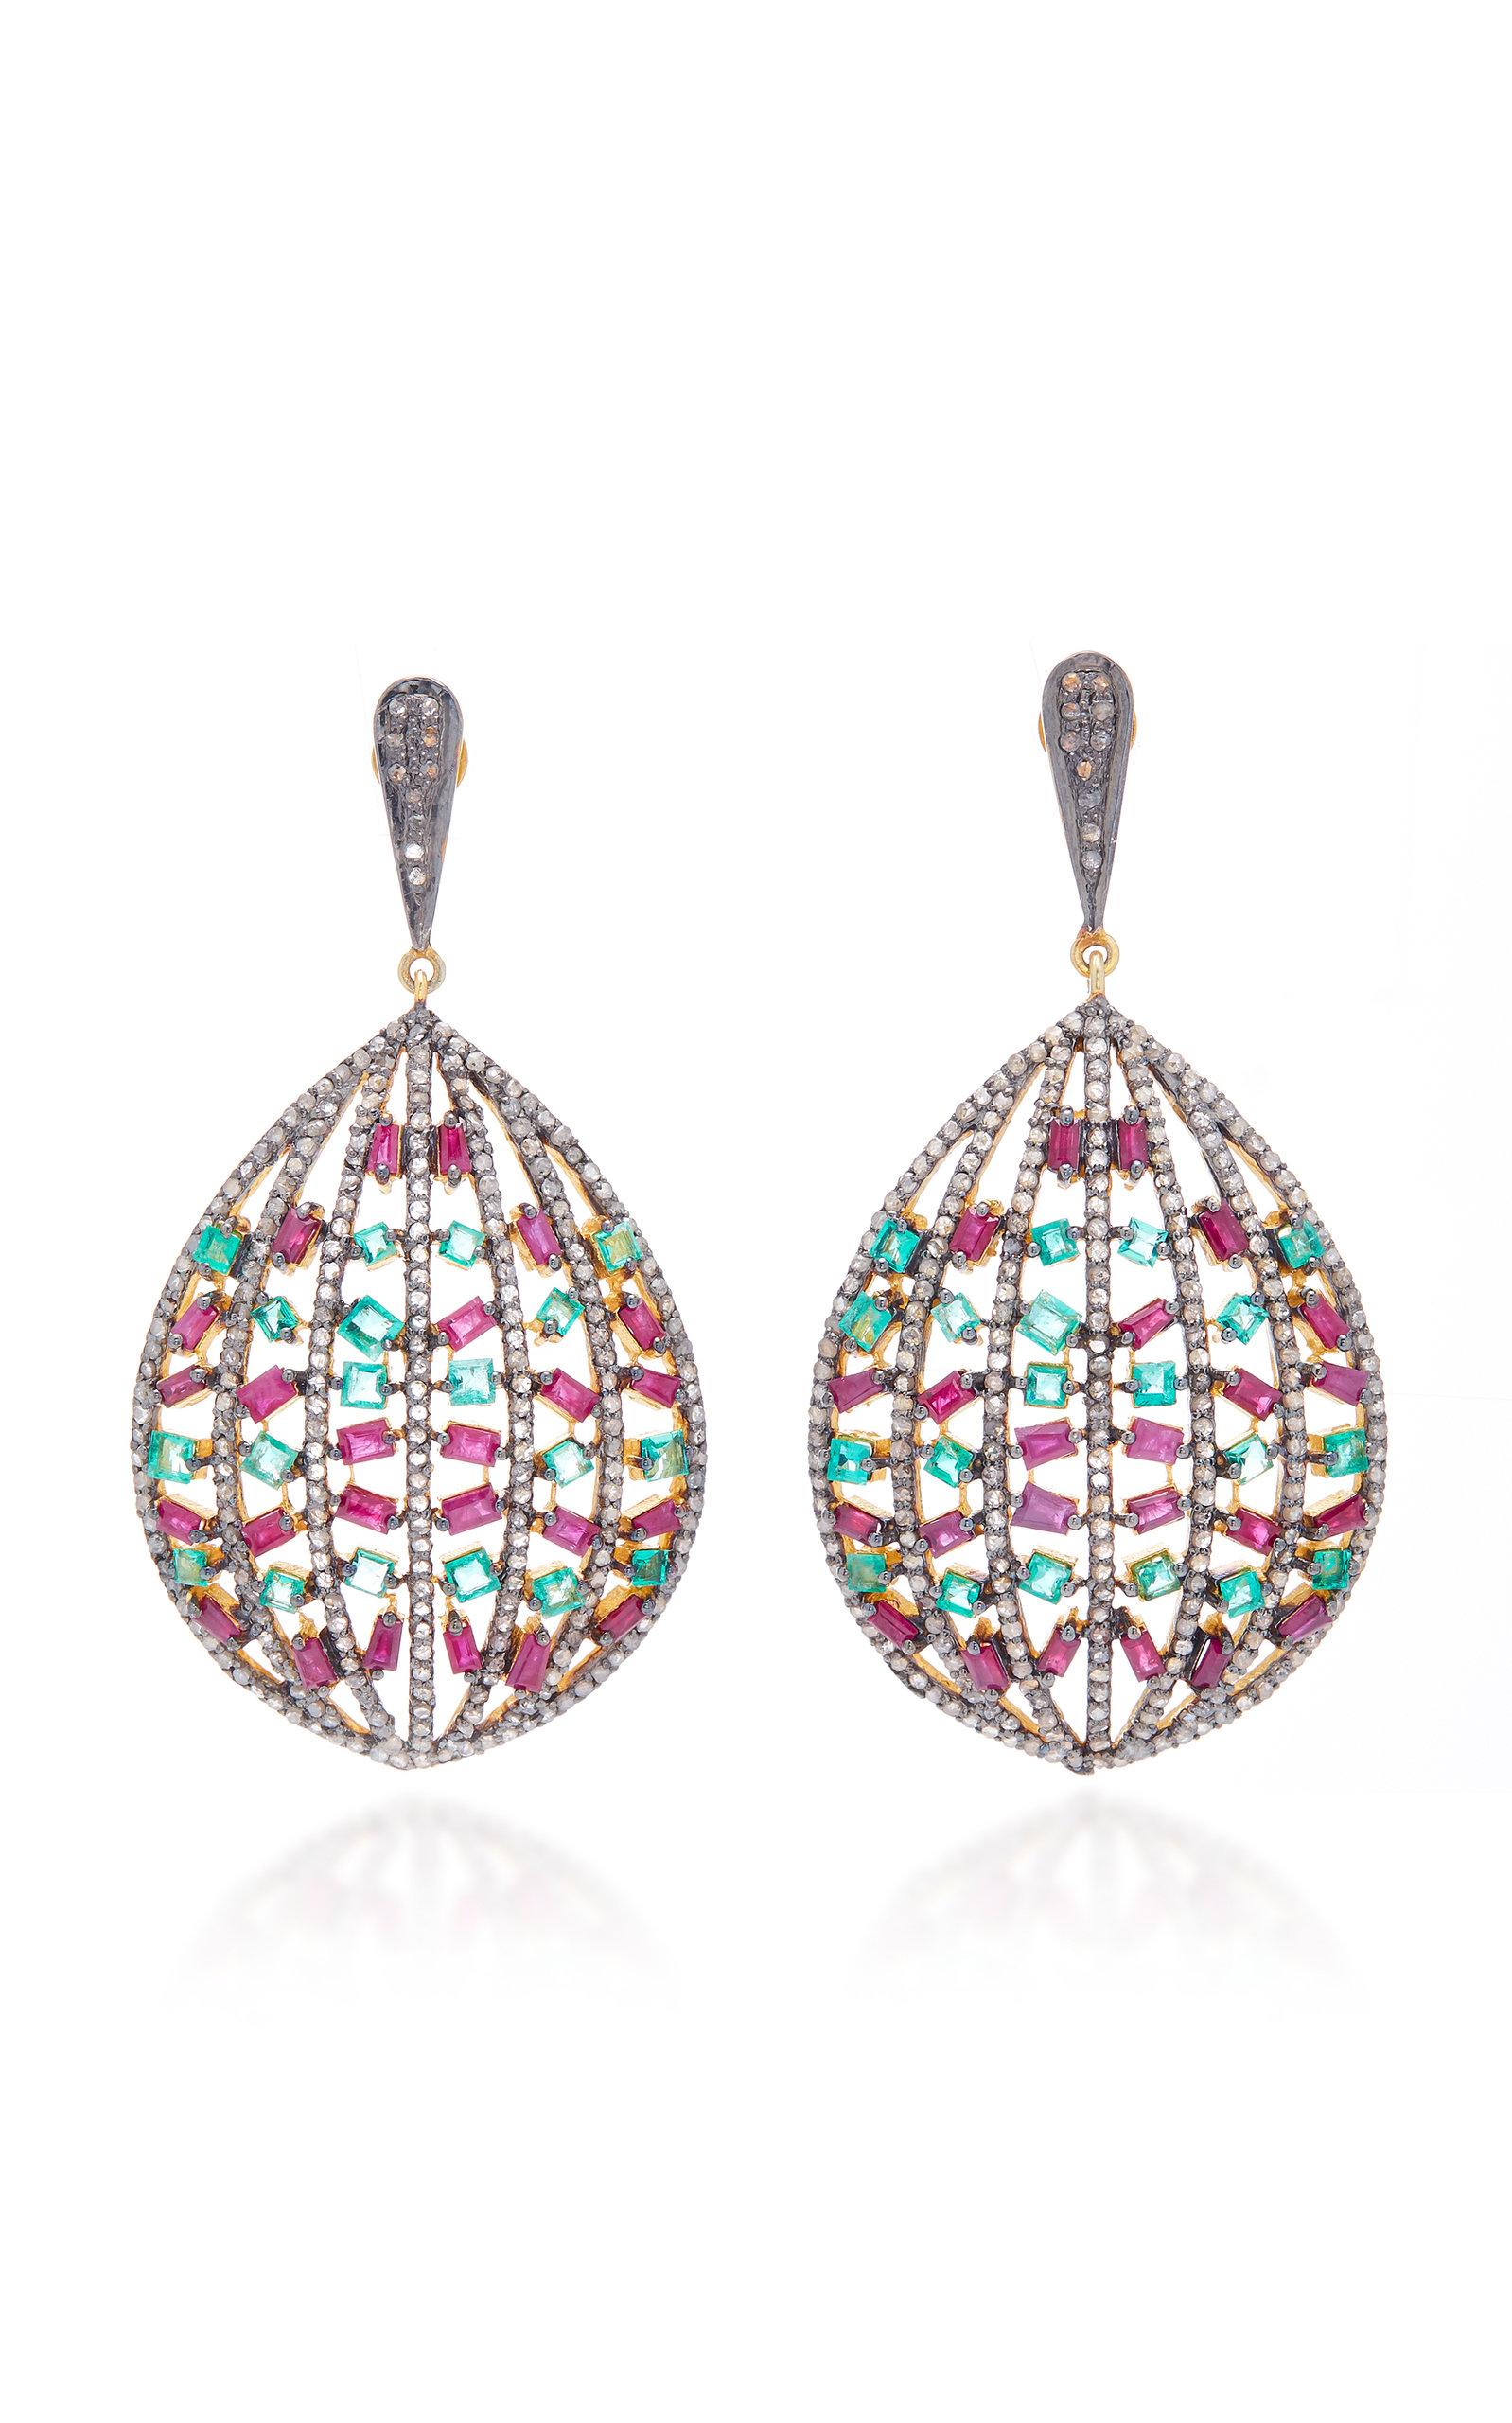 SANJAY KASLIWAL 14K Gold Silver And Multi-Stone Earrings